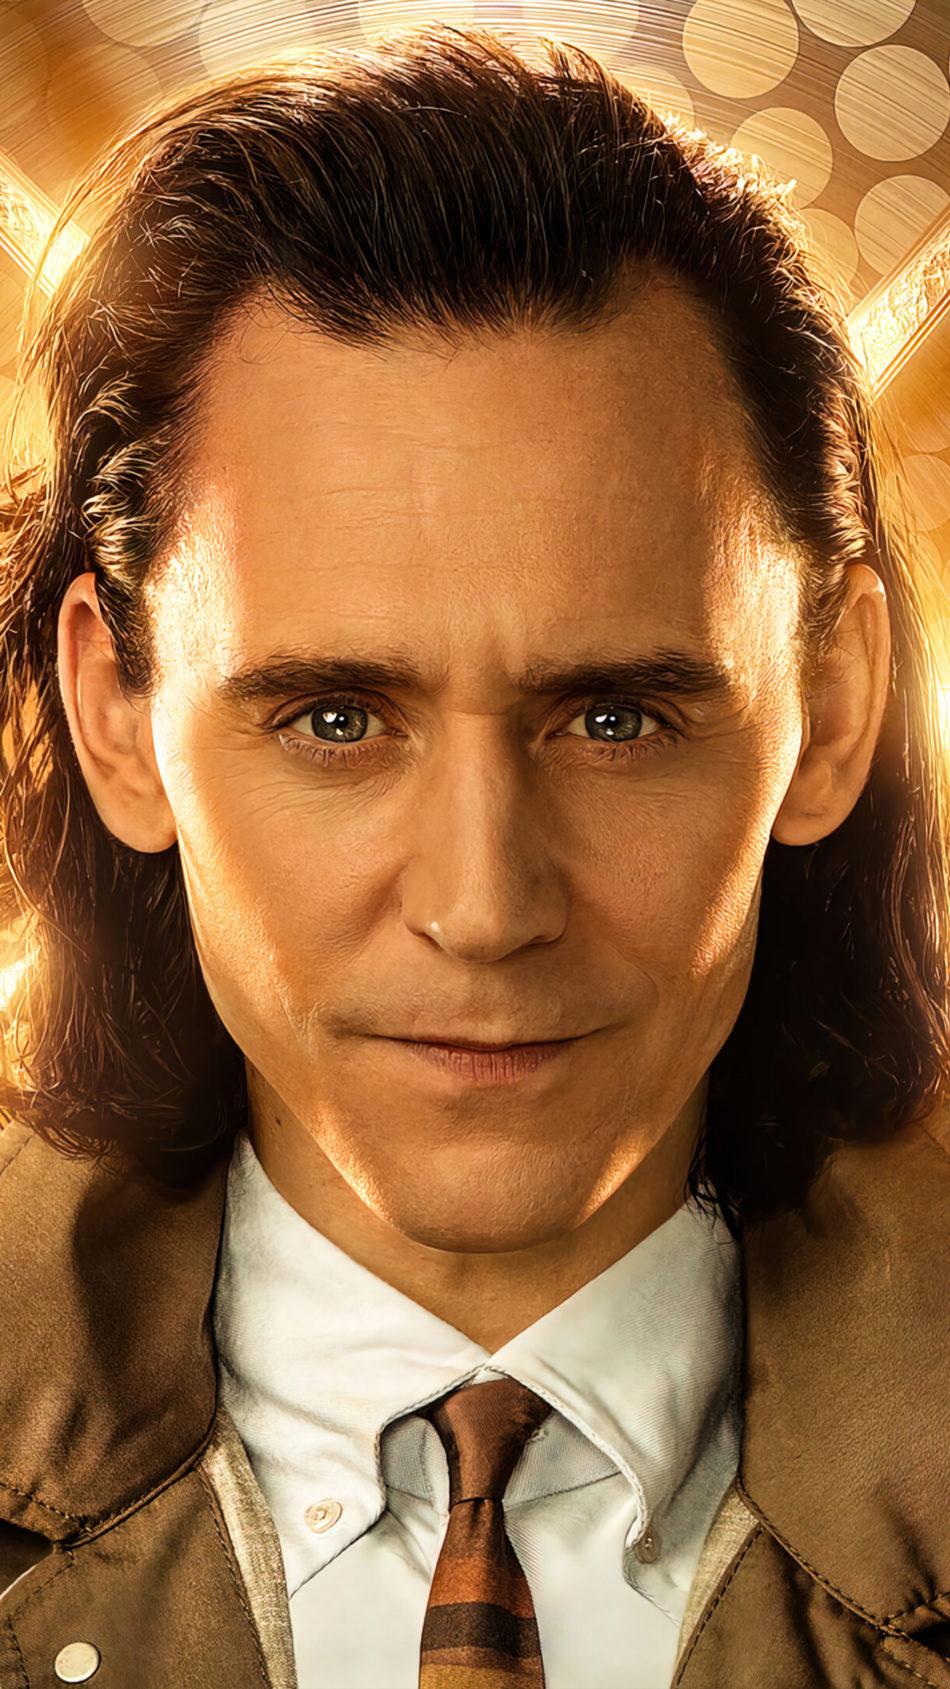 Tom Hiddleston In Loki Series 4K Ultra HD Mobile Wallpaper